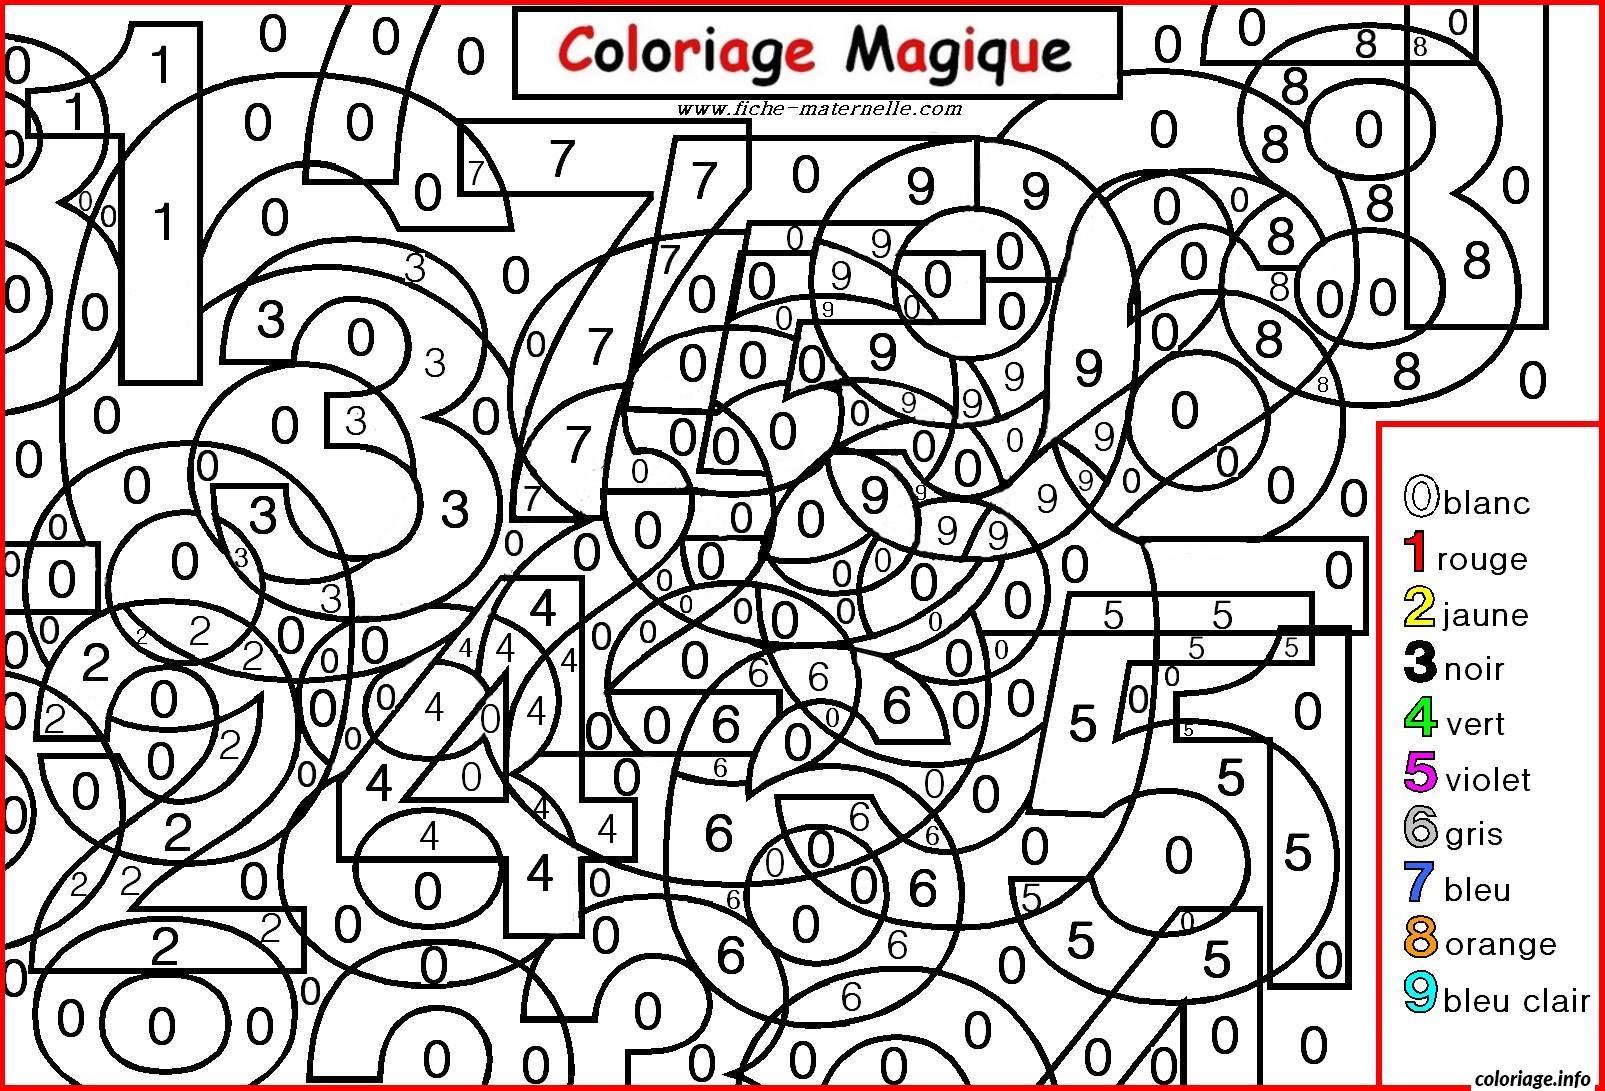 coloriage magique chiffres maternelle dessin. Black Bedroom Furniture Sets. Home Design Ideas